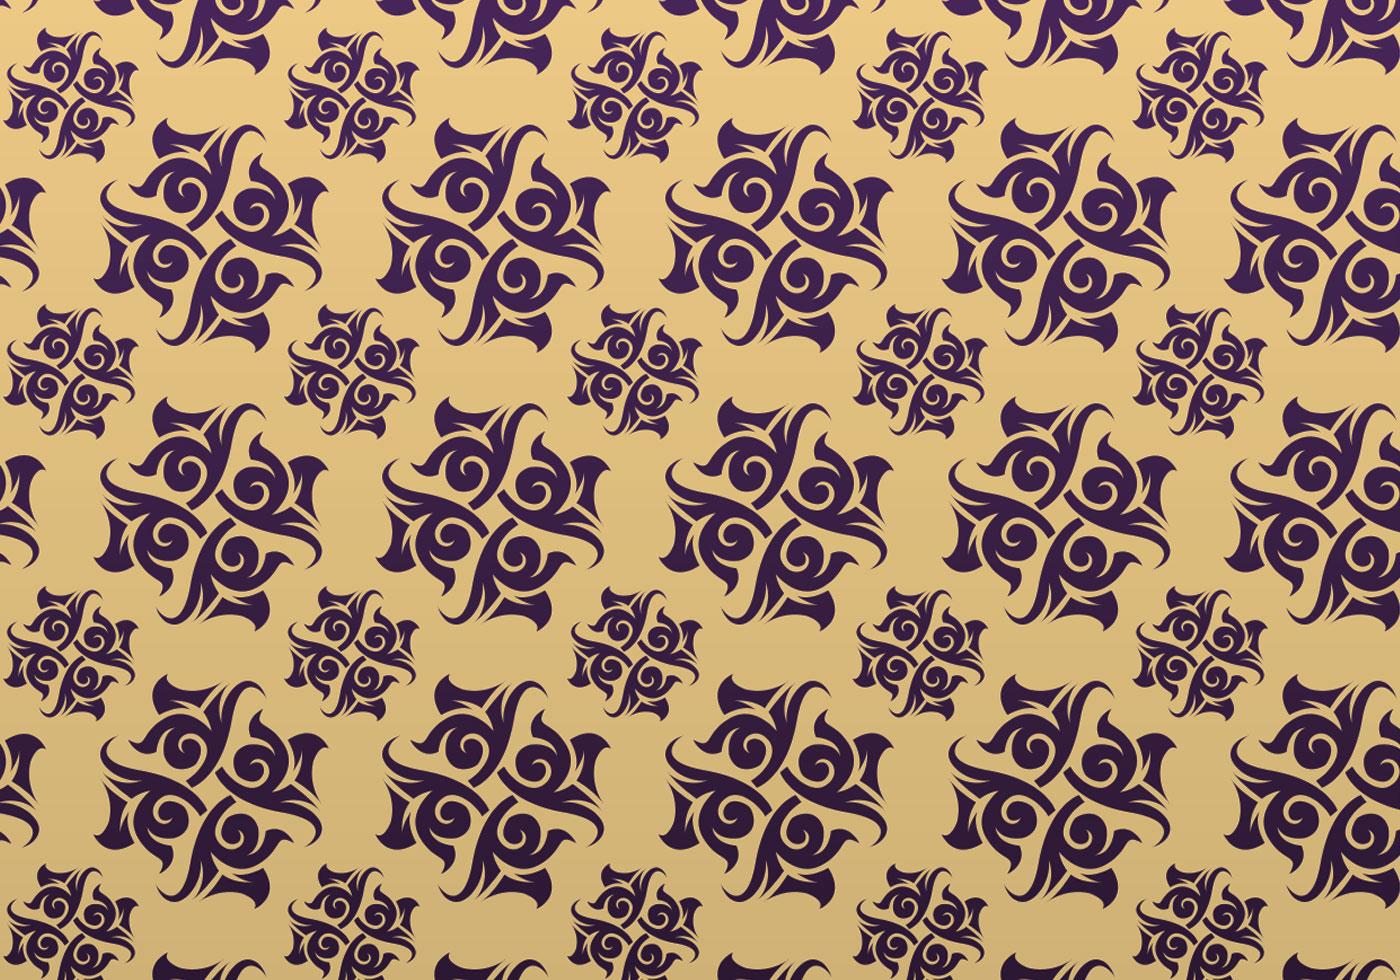 purple and gold ornamental vector patterned background. Black Bedroom Furniture Sets. Home Design Ideas